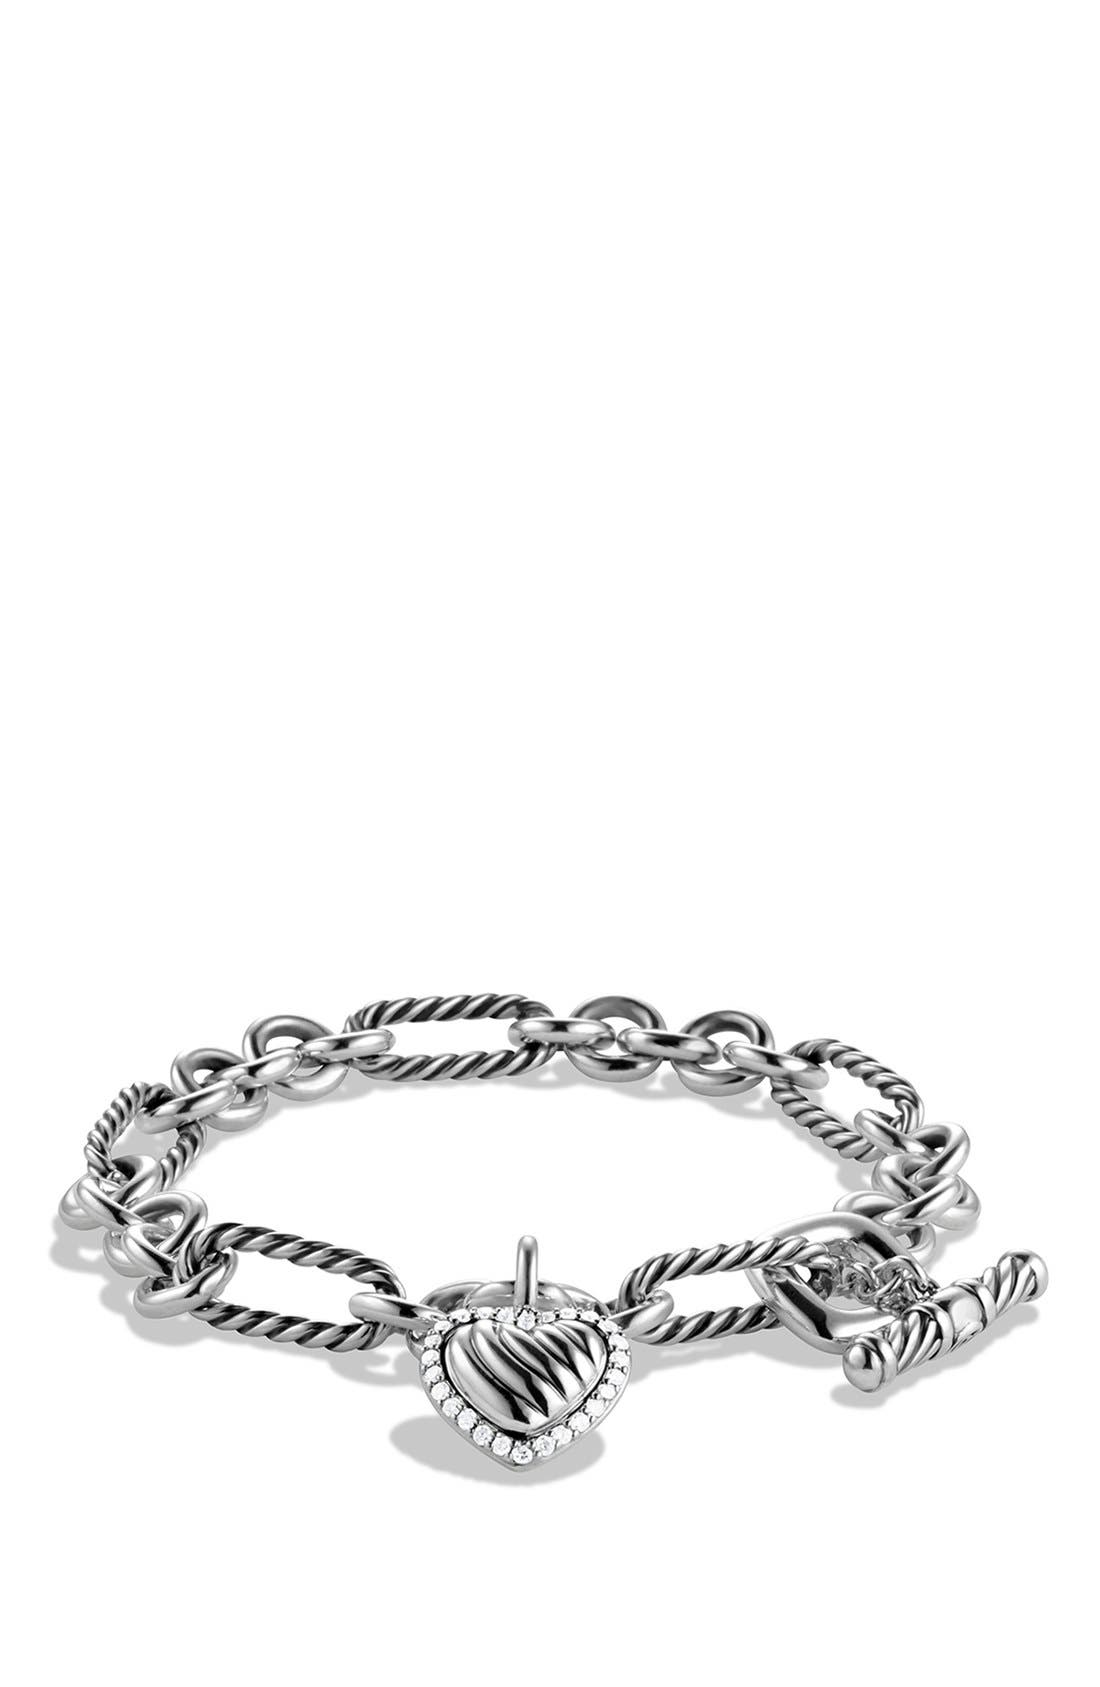 Main Image - David Yurman 'Cable Heart' Charm Bracelet with Diamonds